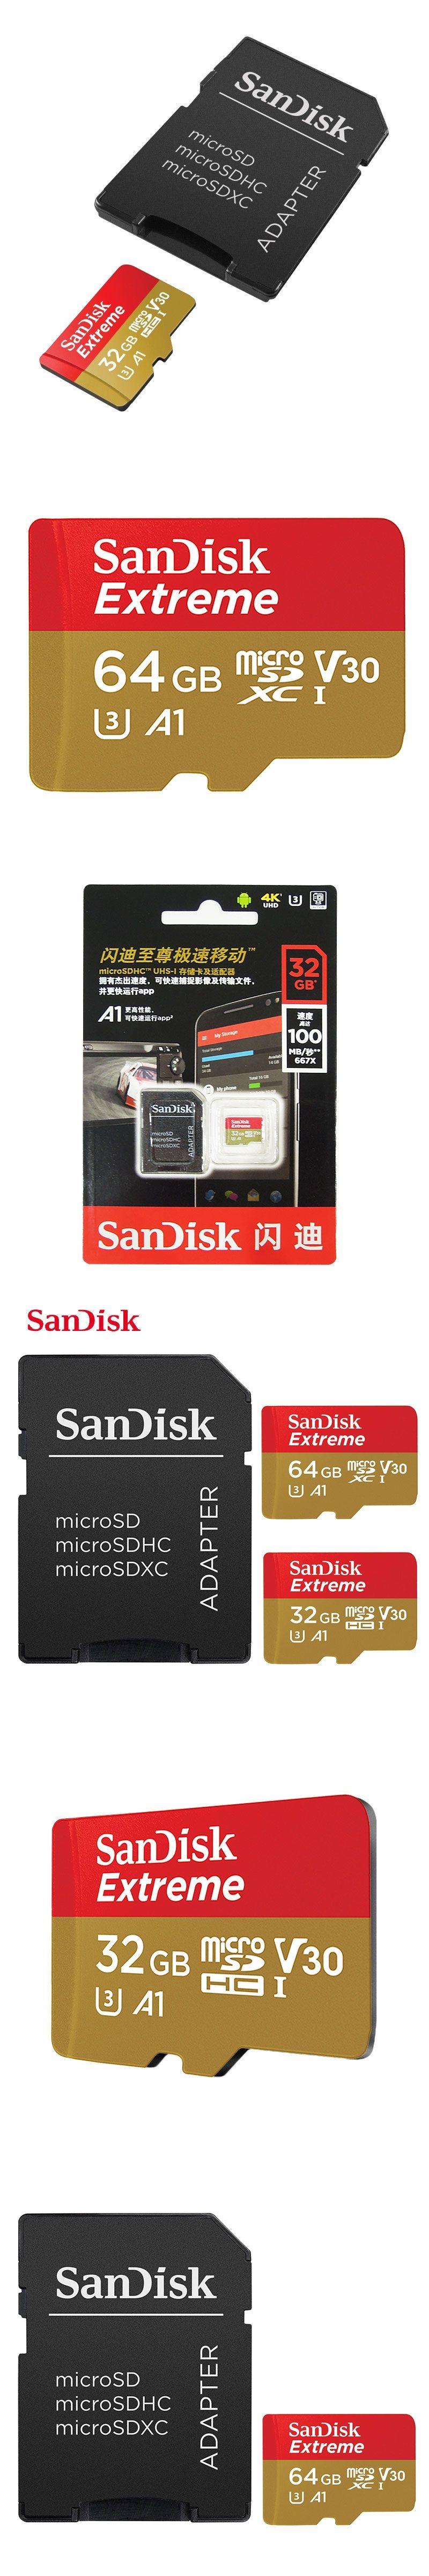 Sandisk Extreme Micro Sd Card 64gb Microsdxc U3 32gb Microsdhc Class 10 Class10 V30 100mb S Tf